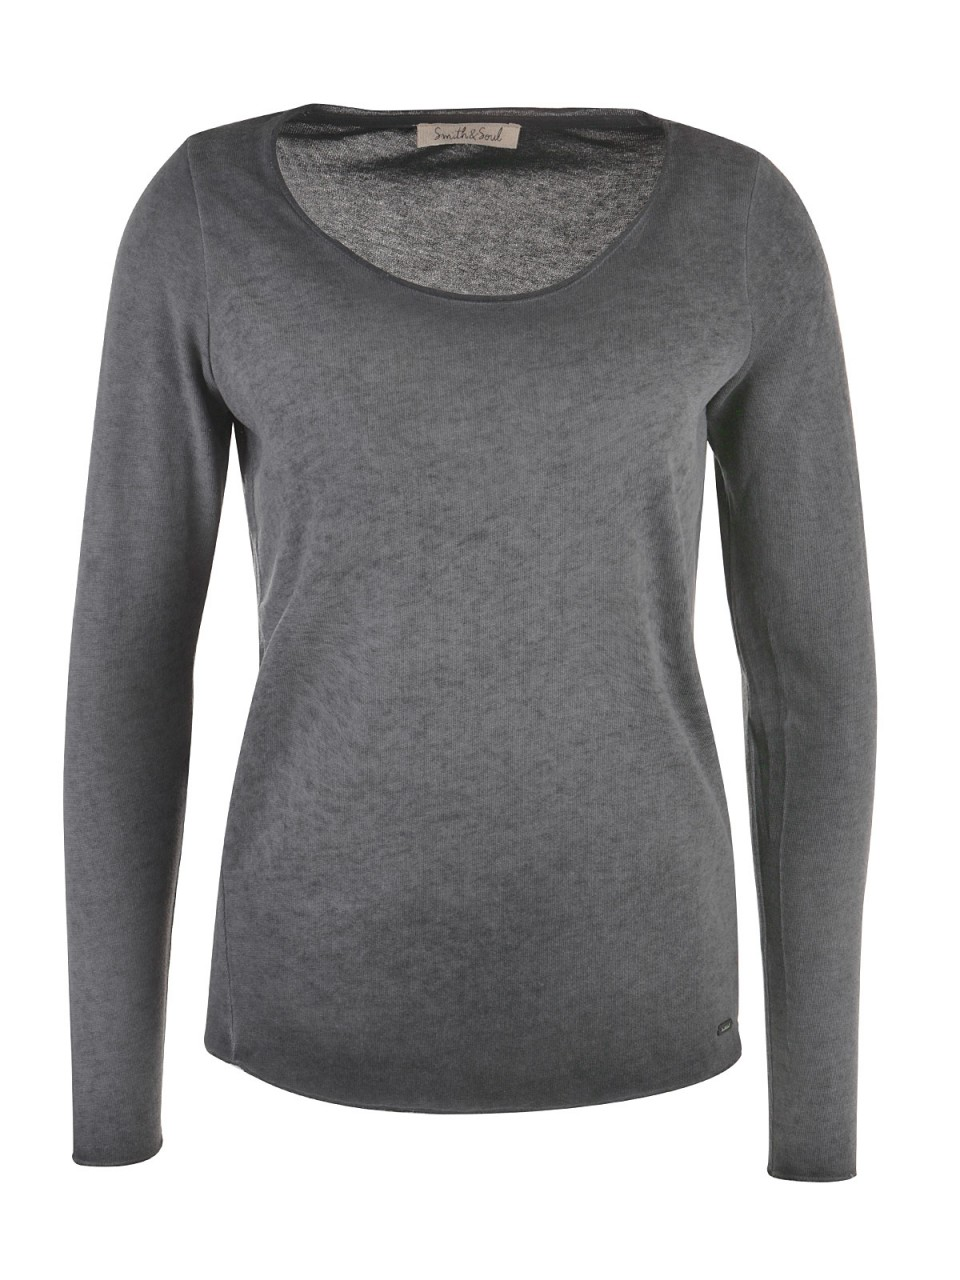 smith-amp-soul-damen-shirt-schwarz